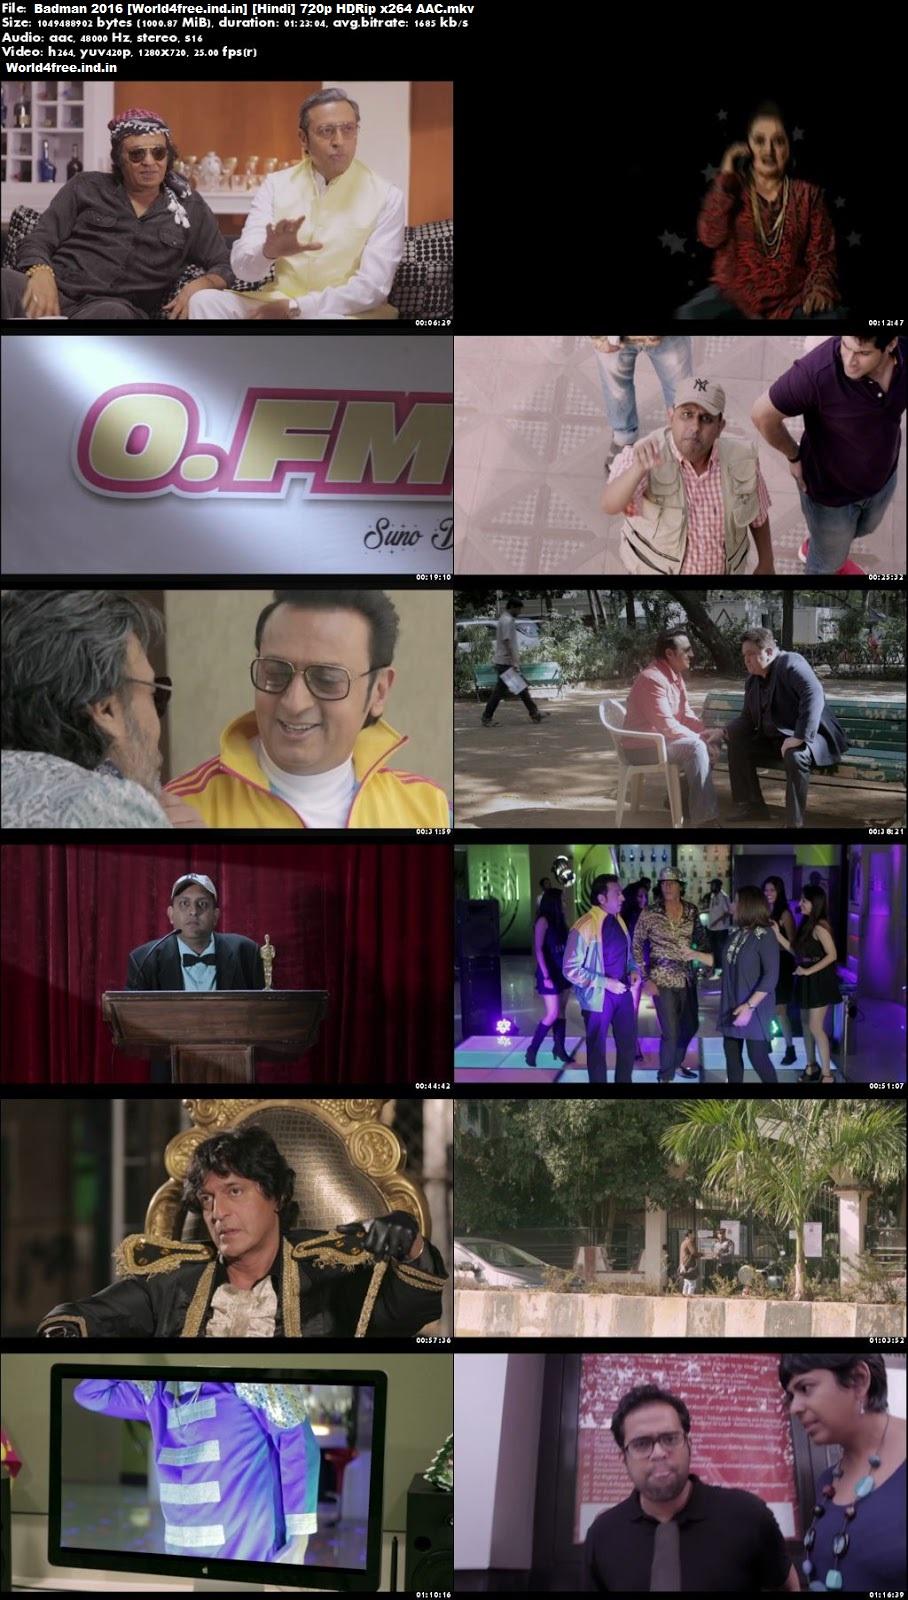 Badman 2016 world4free.ind.in HDRip 720p Full Hindi Movie Download